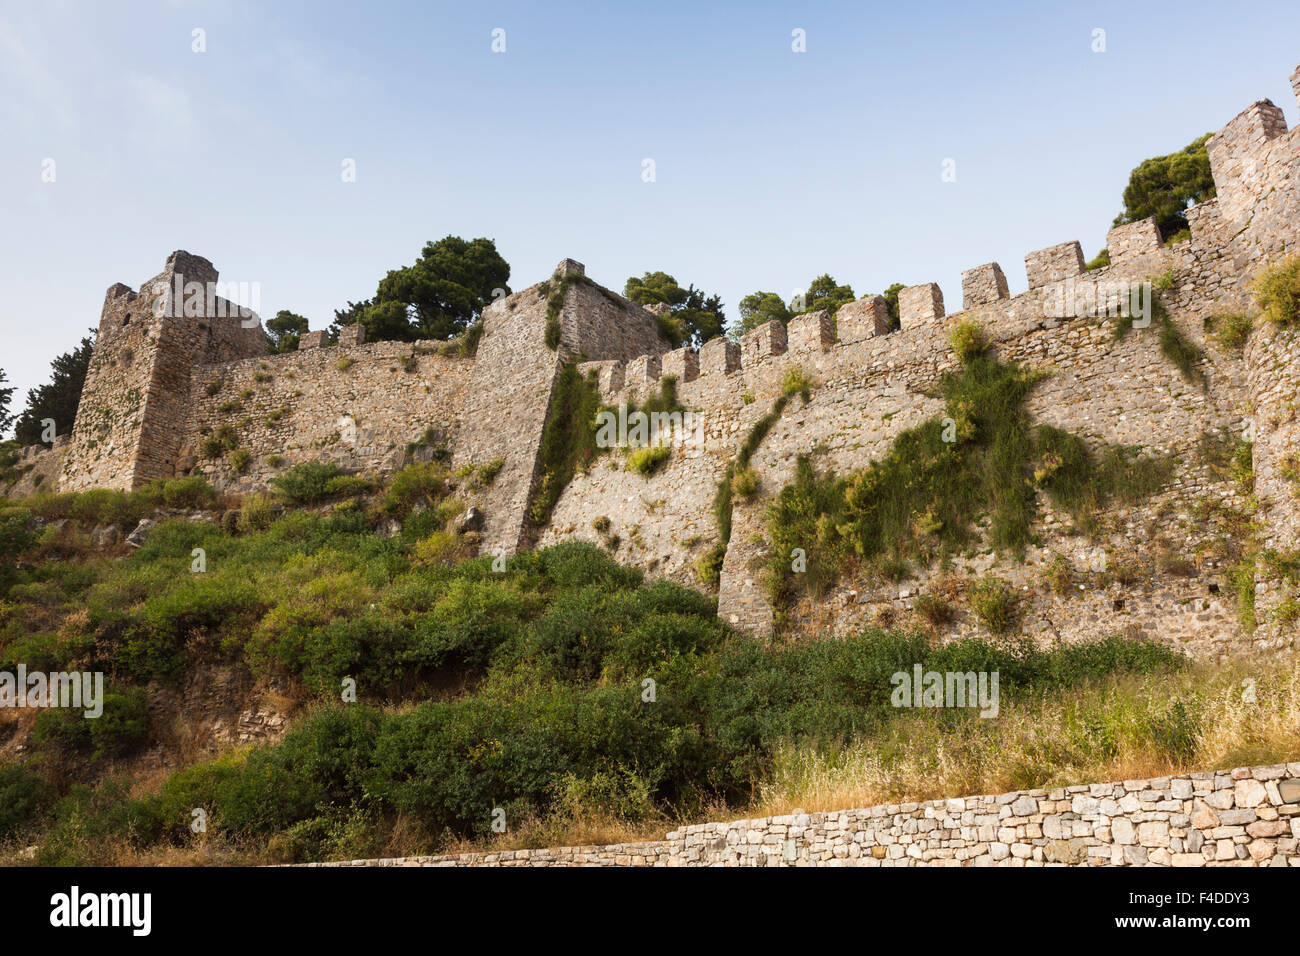 Griechenland, Westgriechenland, Nafpaktos, Zitadelle, venezianische Festung Stockbild